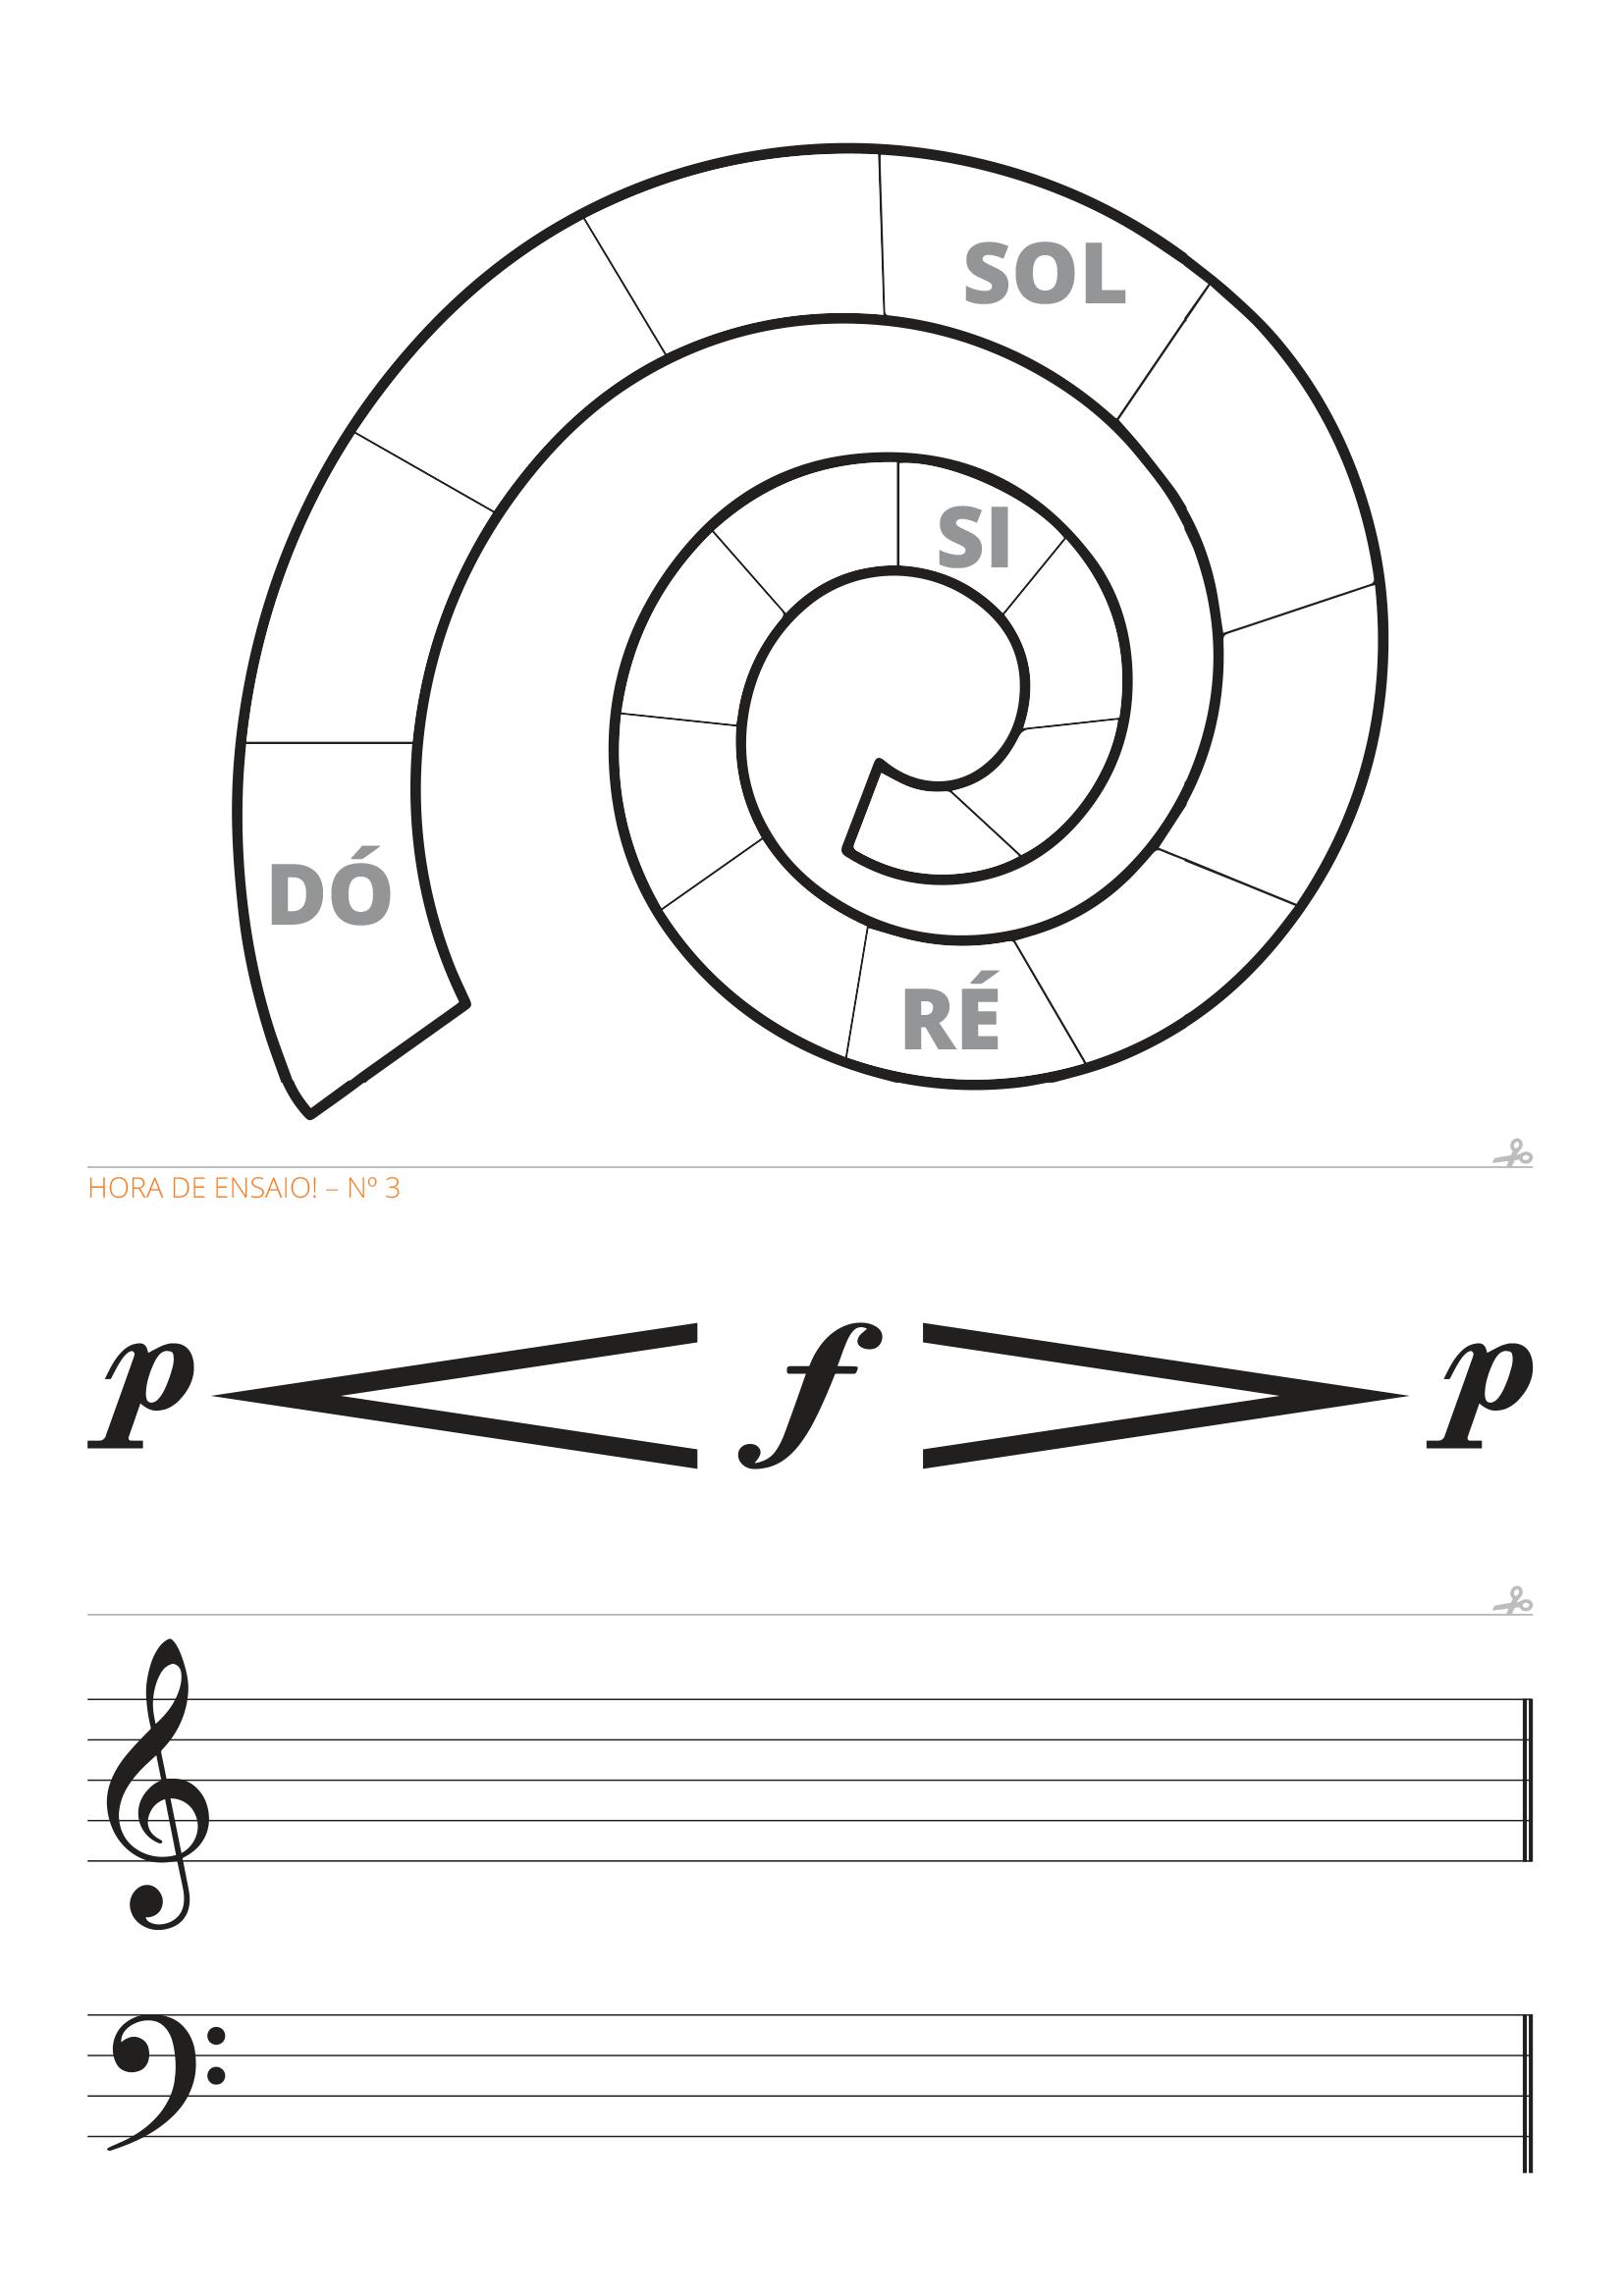 Exercícios para entender sobre pautas musicais